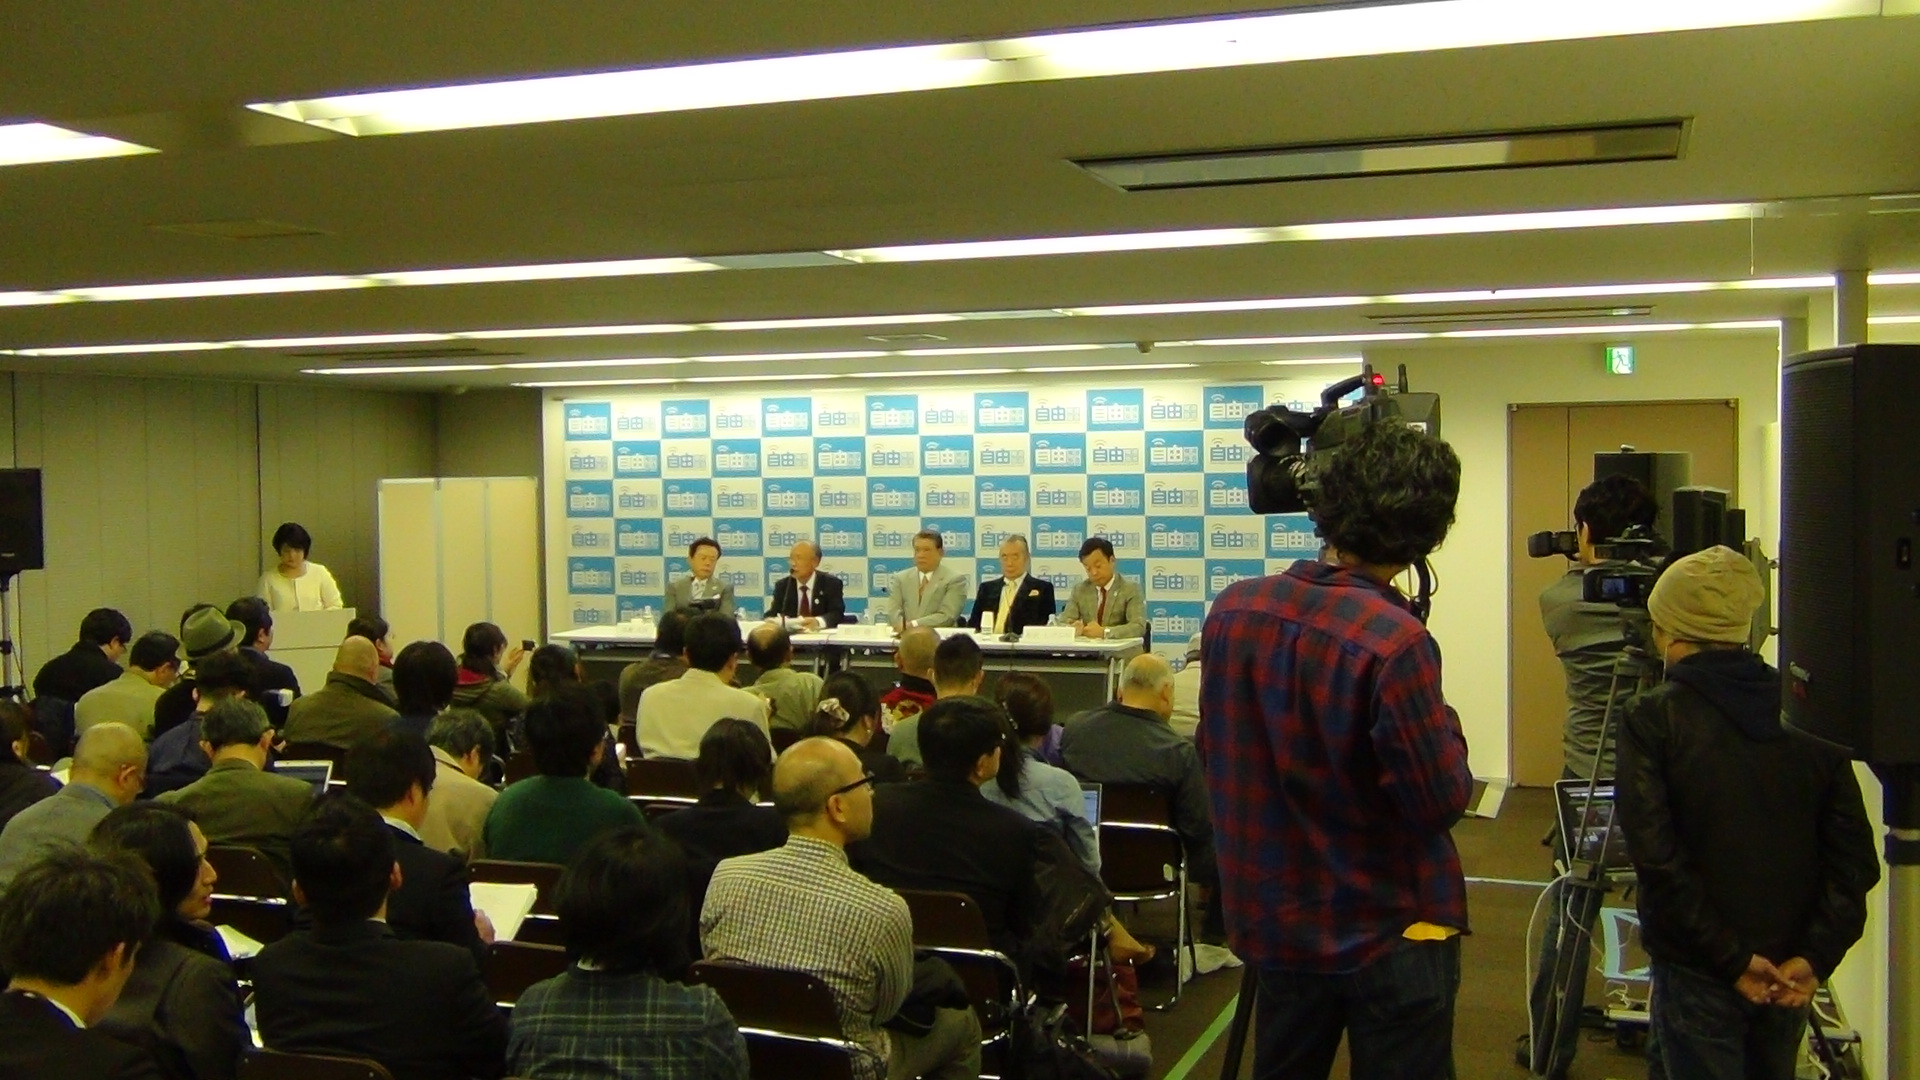 http://daily.magazine9.jp/m9/oshidori/DSC01036%5B1%5D.JPG